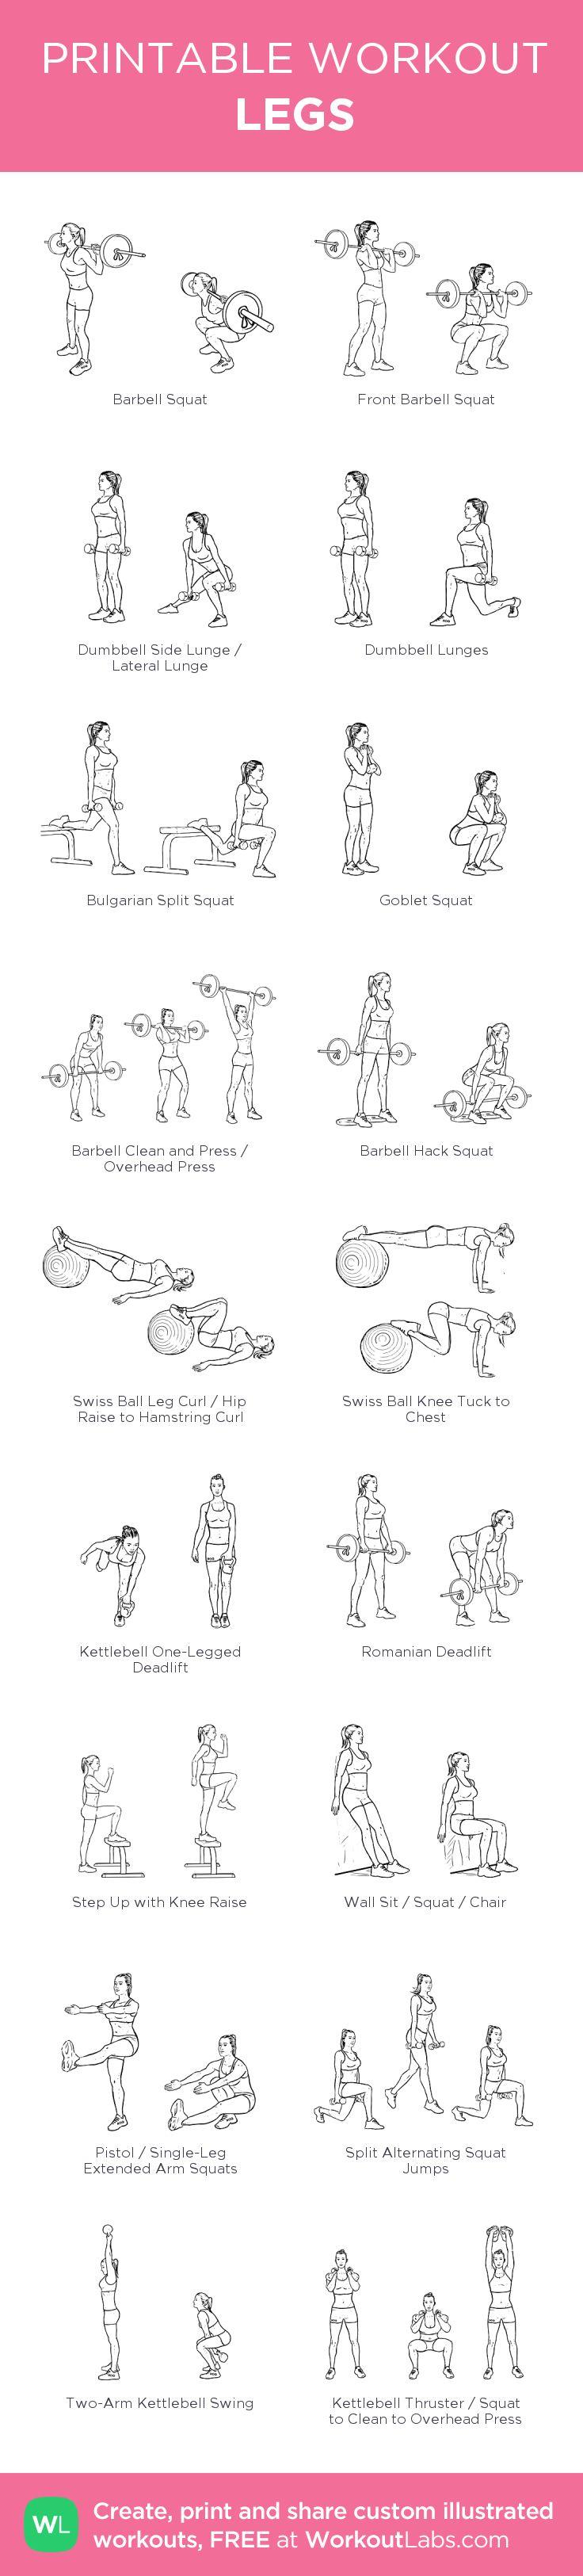 LEGS: pick 8-10 #customworkout